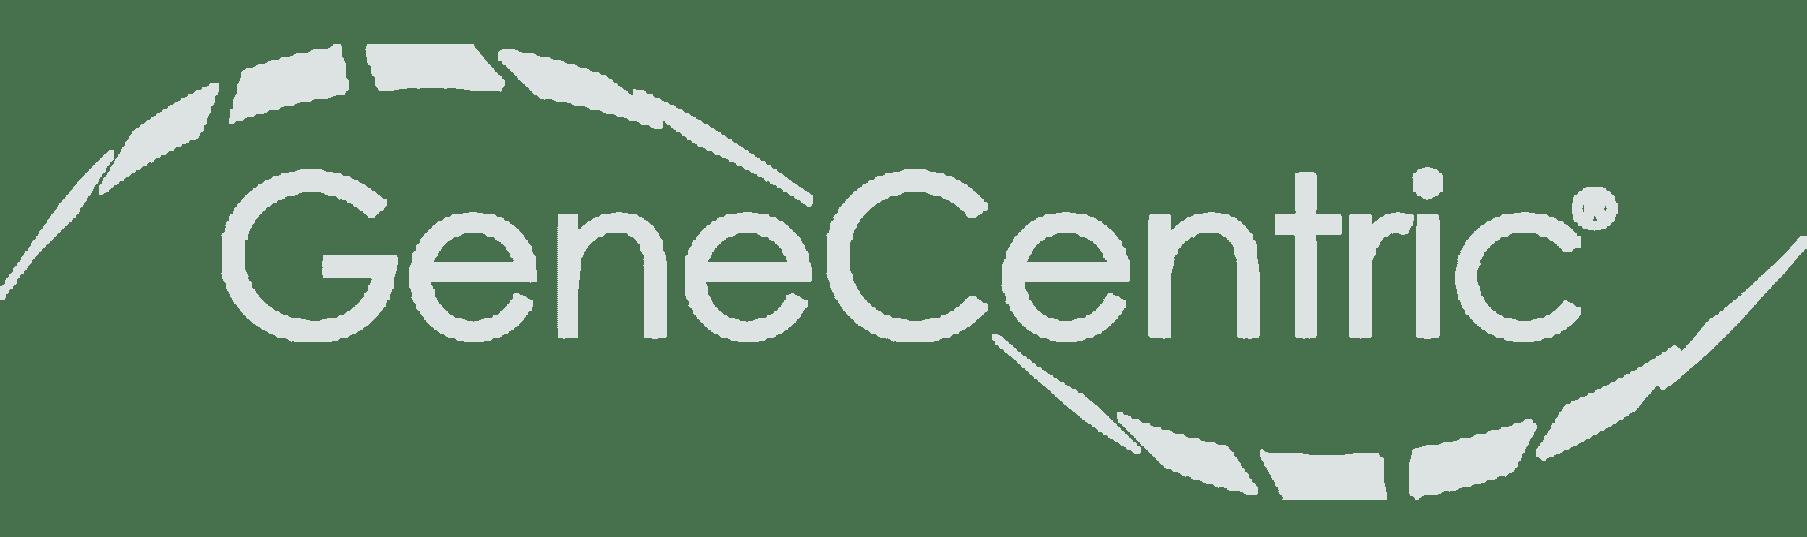 GeneCentric and Collaborators at Washington University Advance